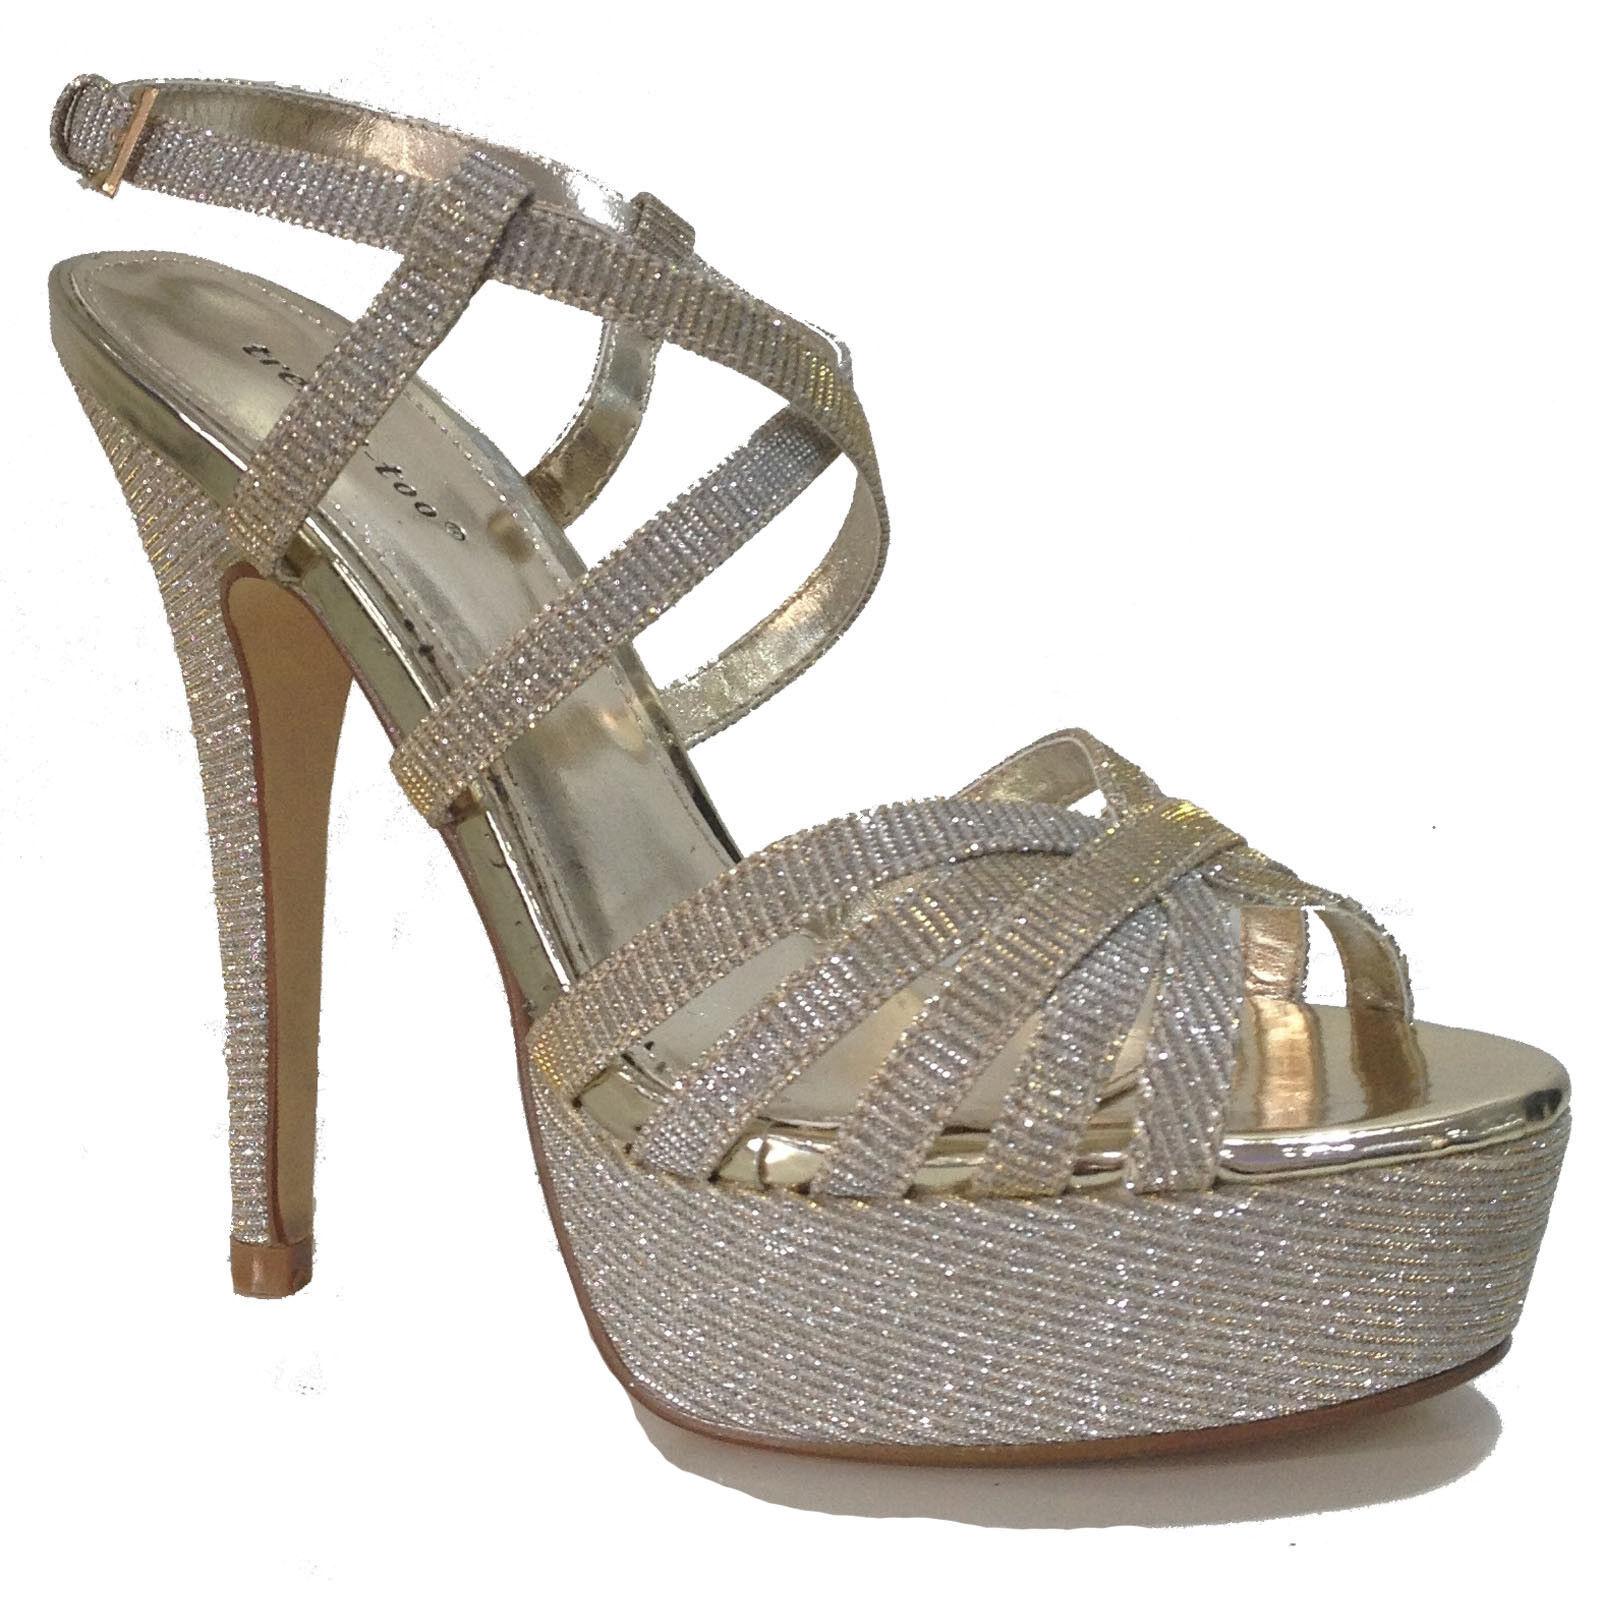 ☼ELEN☼ Sandales à talon - avec plateforme - talon TRENDY TOO - Ref  0891 76c70b